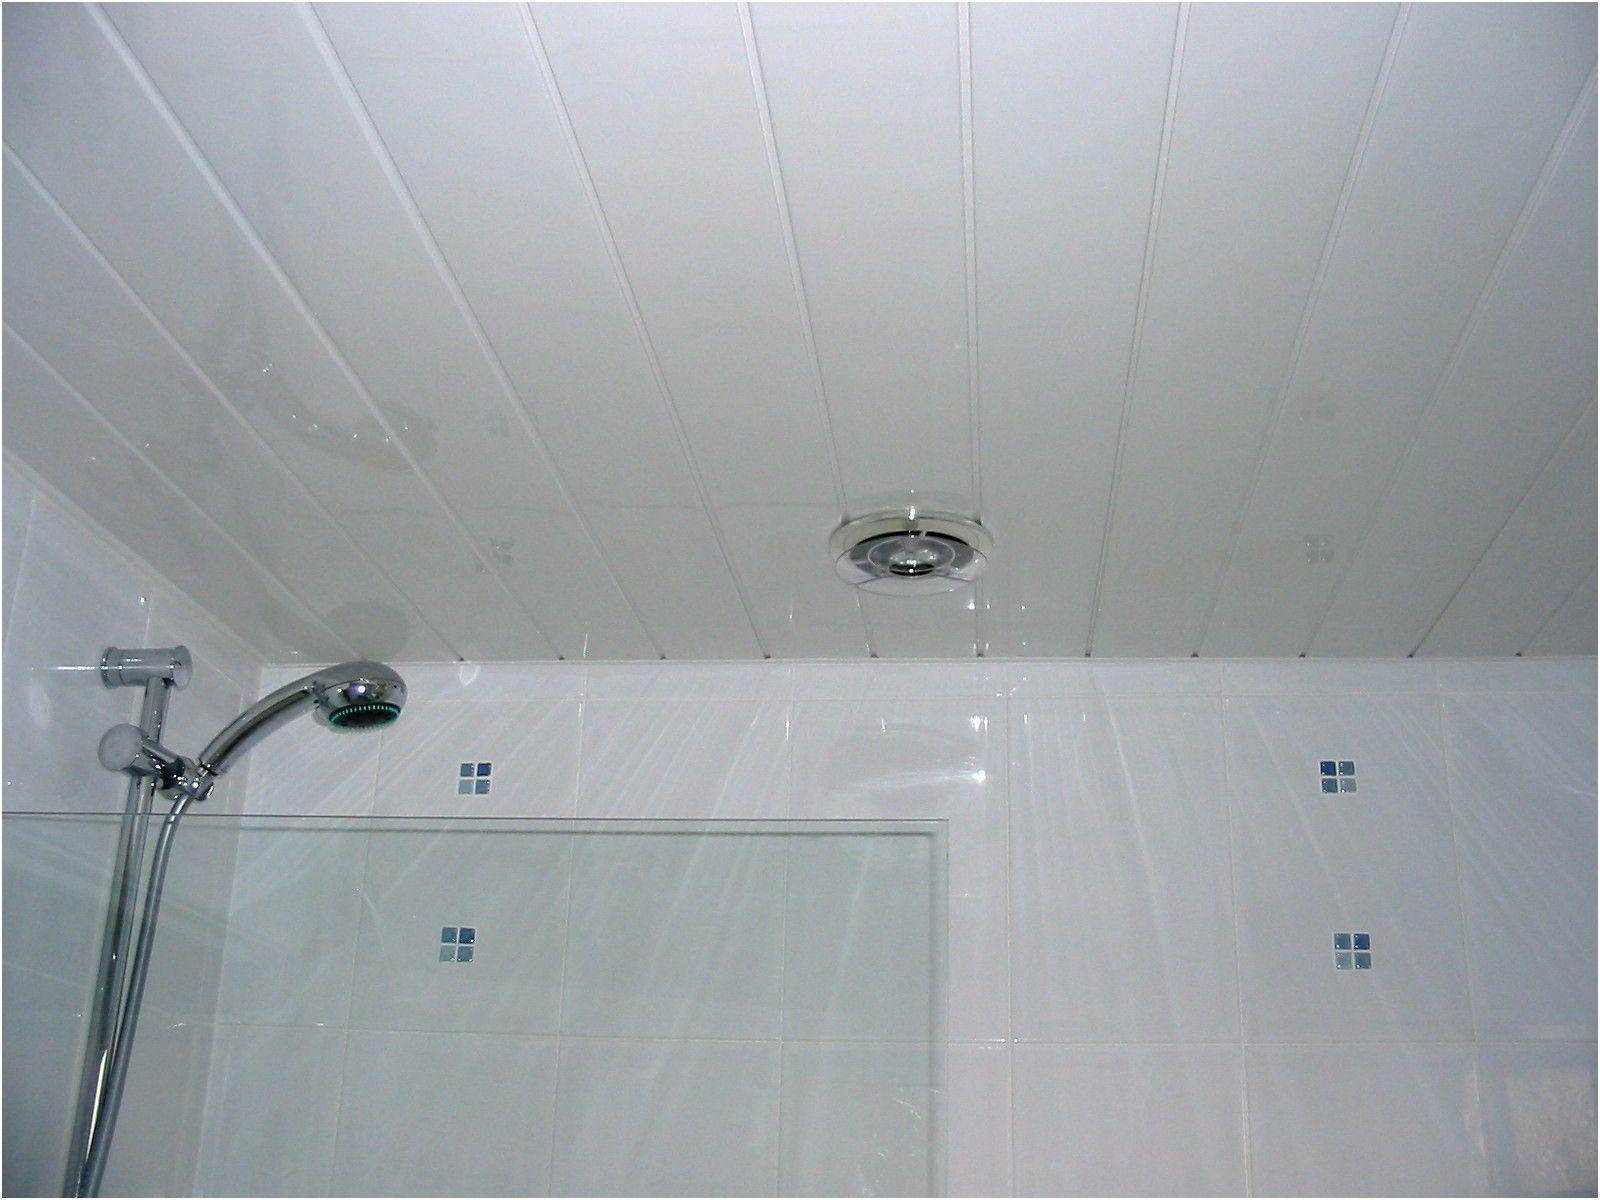 Bathroom bathroom ceiling tiles panels - Awesome Best Of Bathroom Ceiling Tiles Panels Mifd283 Awesome Best Of Bathroom Ceiling Tiles Panels Doublecrazyfo